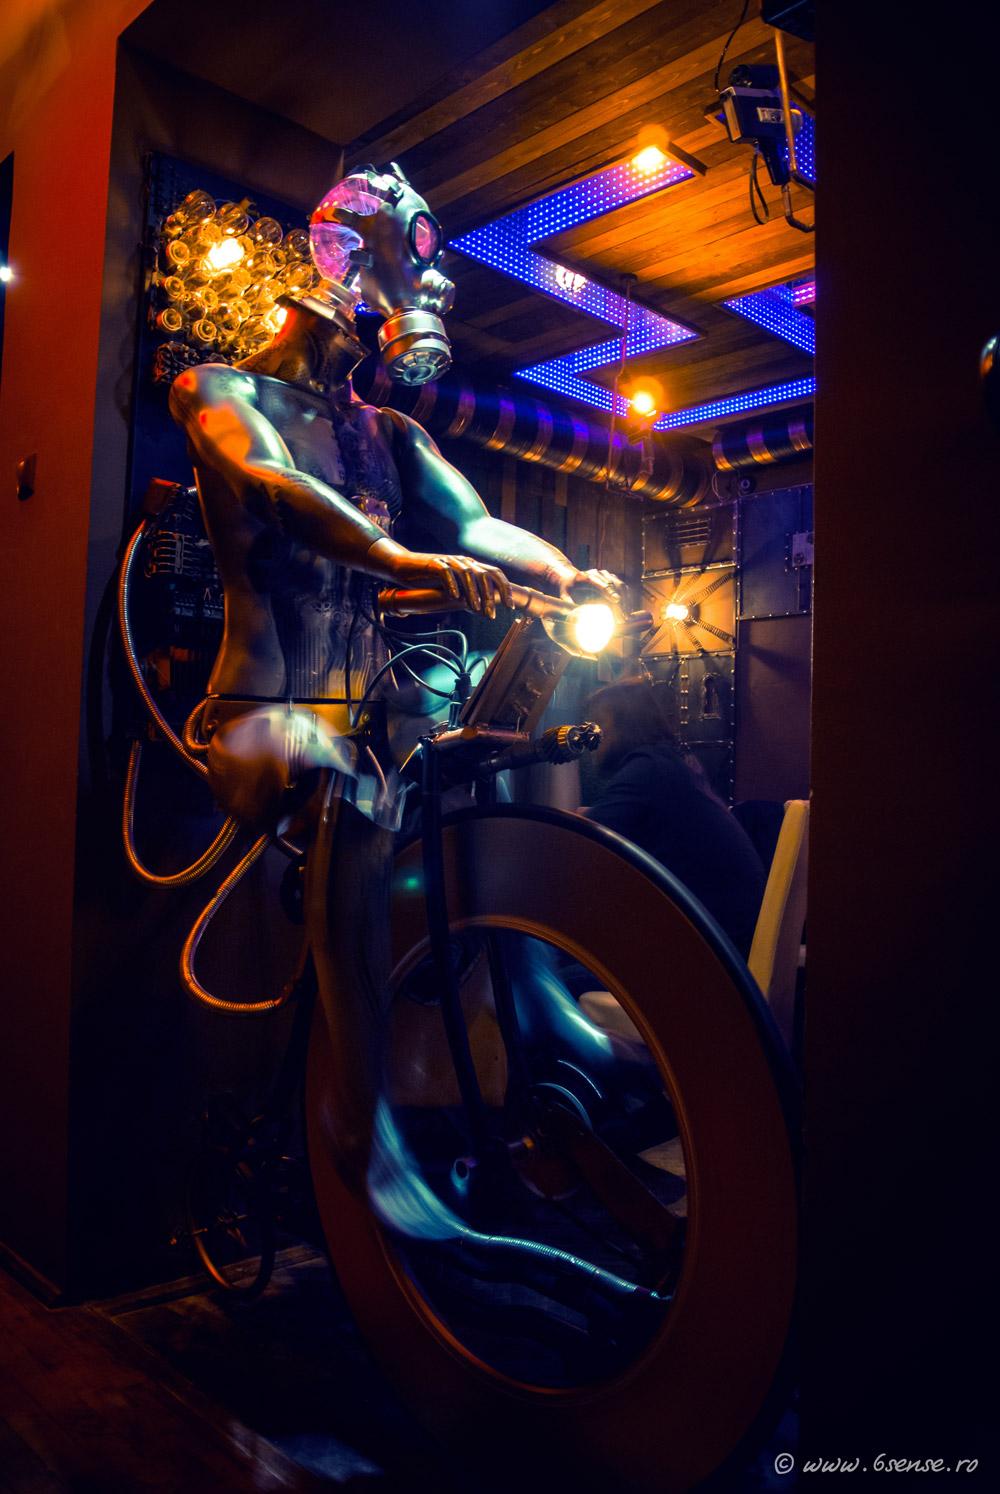 Enigma-cafe-cluj-design-interior (22)